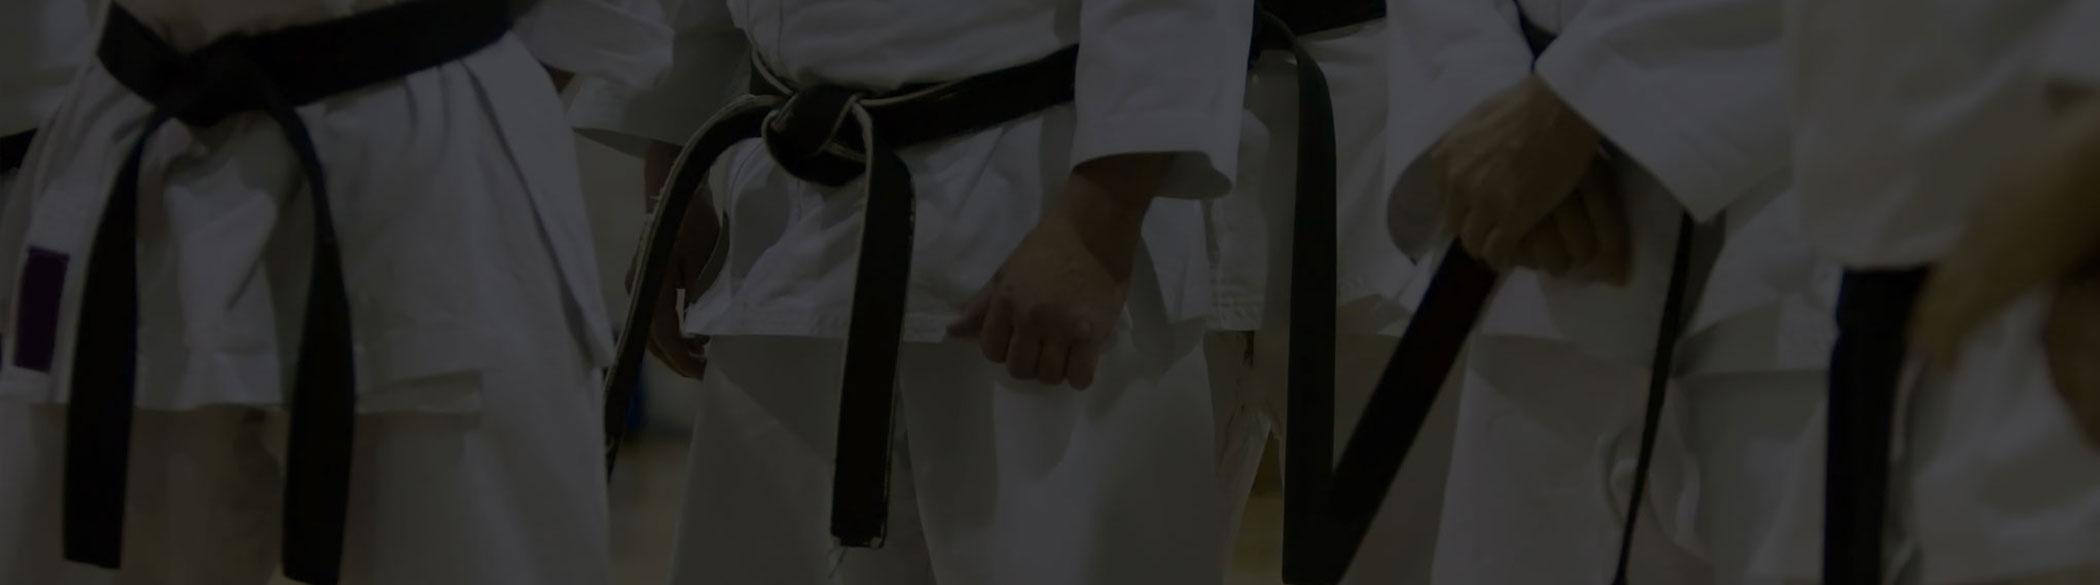 Landing_Page_martial_arts_H1.jpg